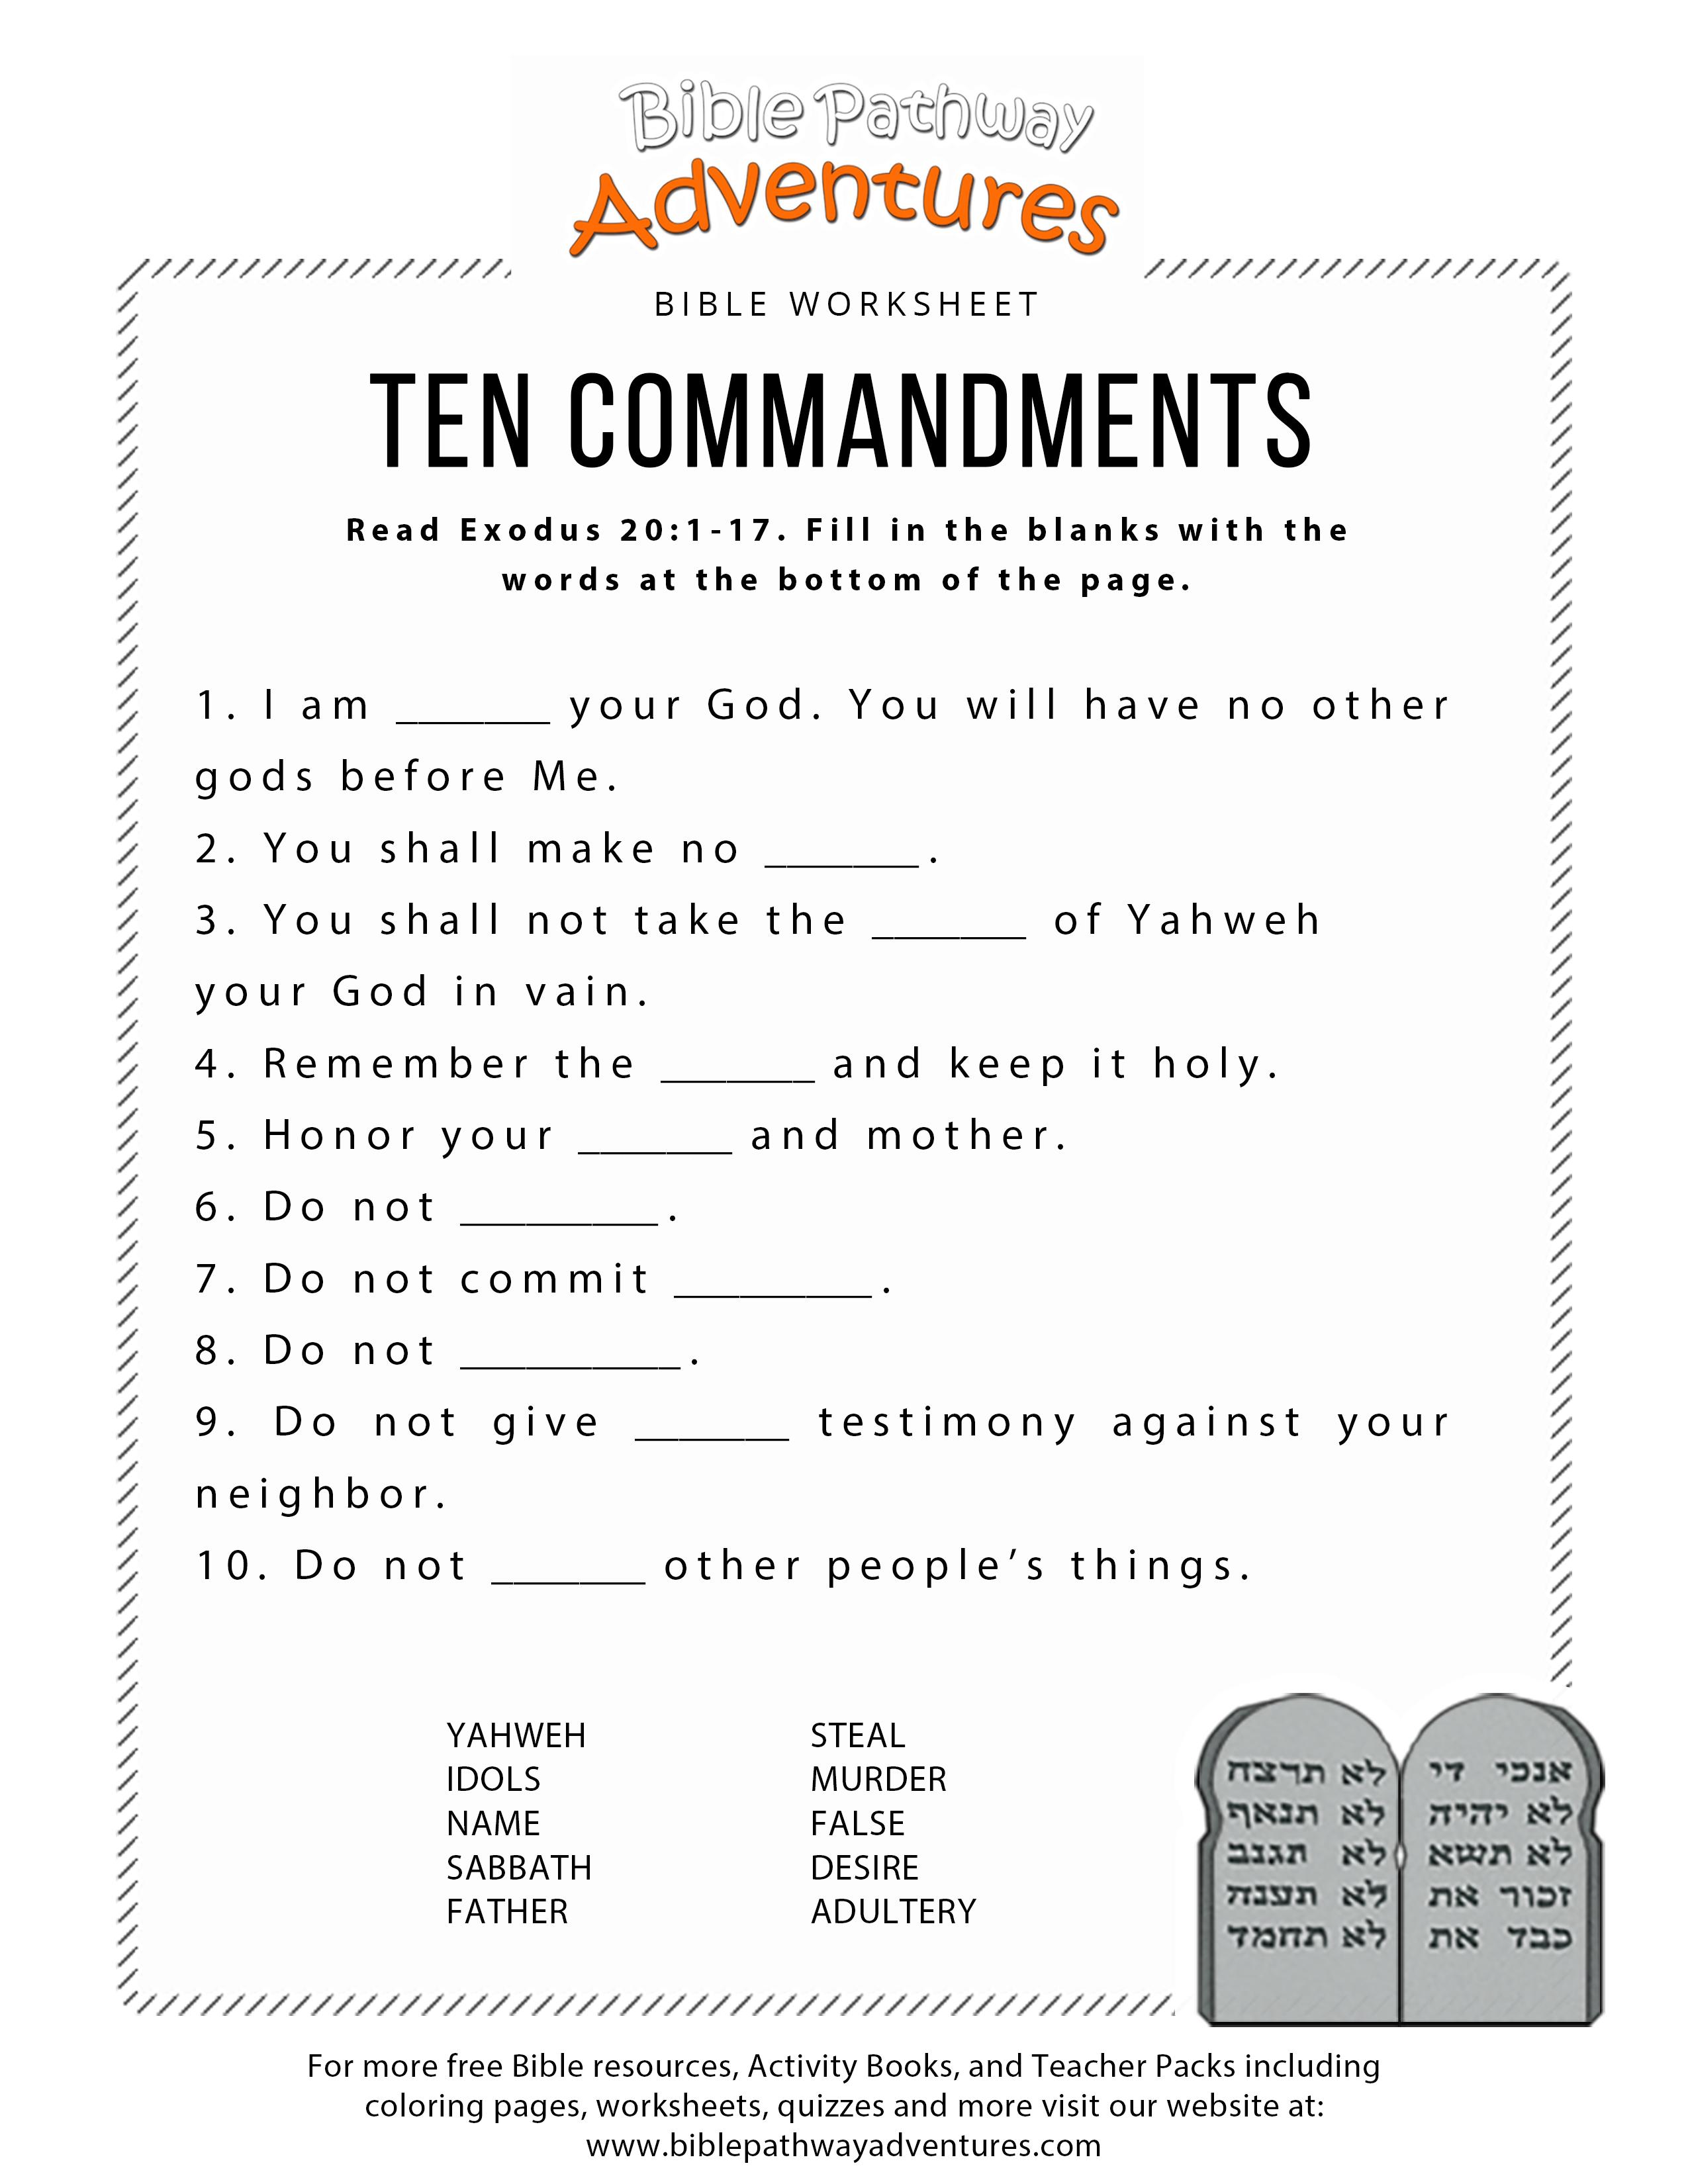 Ten Commandments Worksheet For Kids - Free Printable Children's Bible Lessons Worksheets